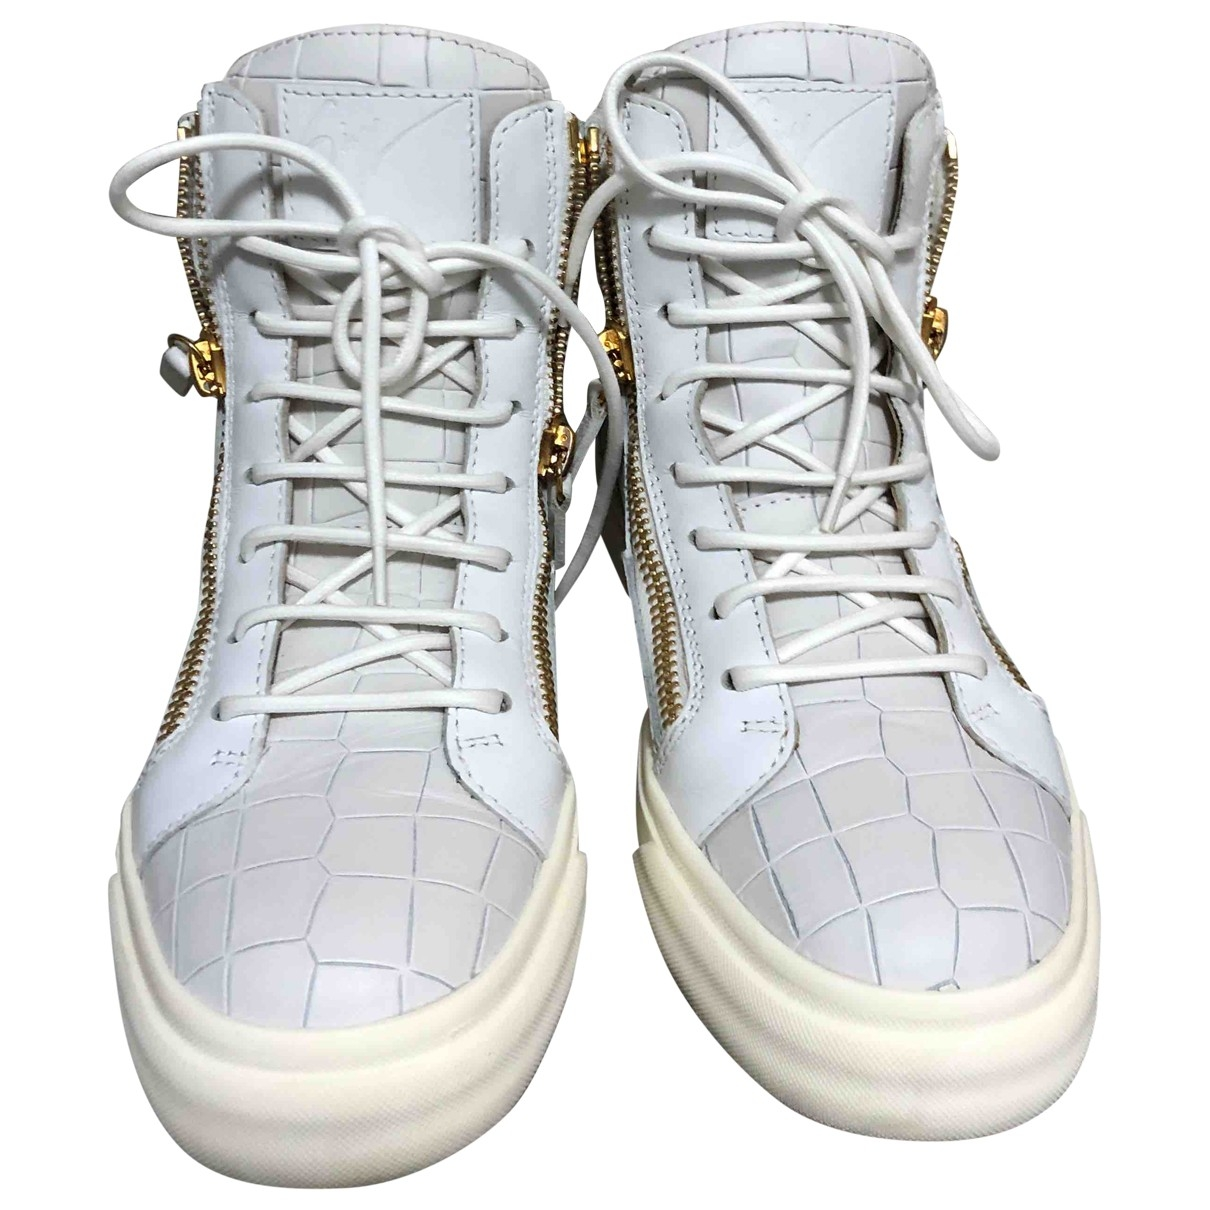 Giuseppe Zanotti - Baskets Nicki pour femme en cuir - blanc